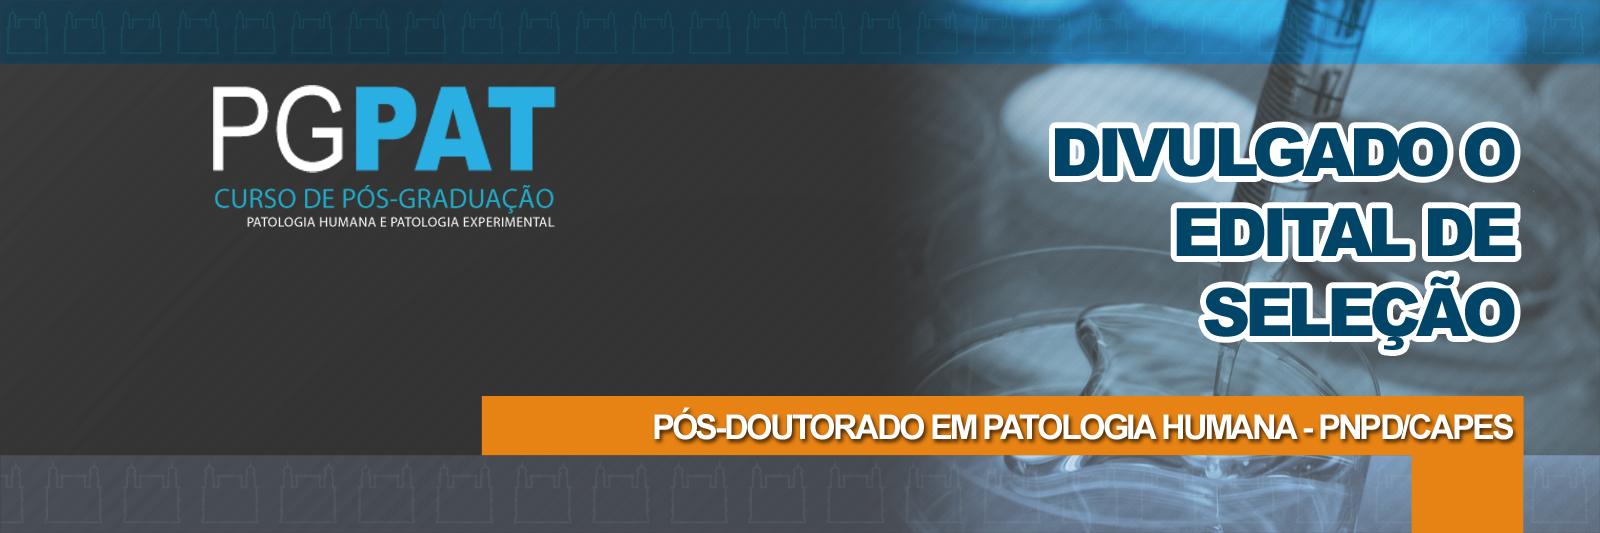 PGPAT posDoc